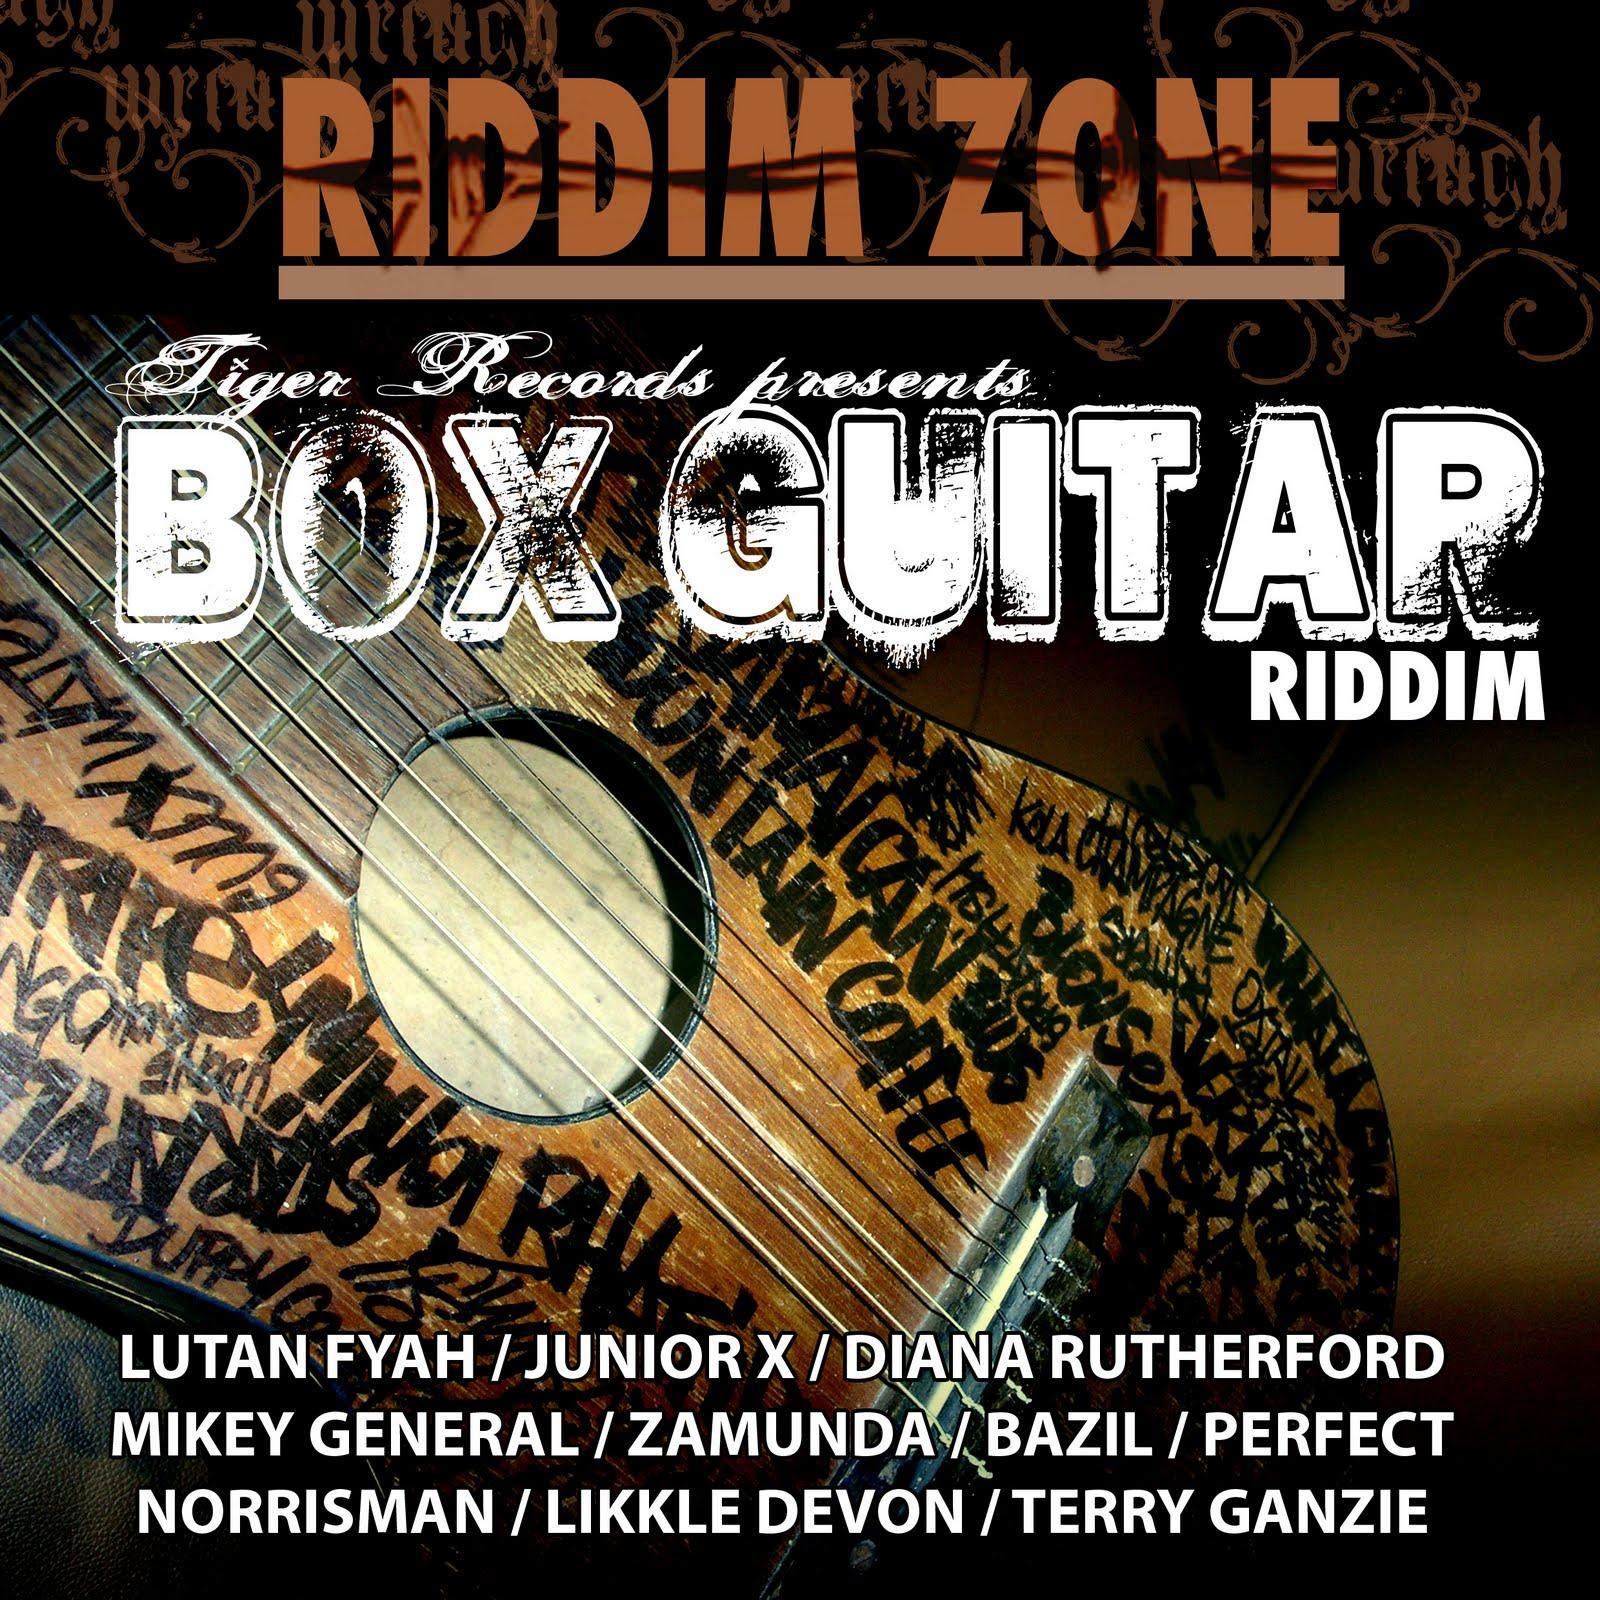 The Reggae Review: 'Box Guitar' Riddim Review (Tiger Records)